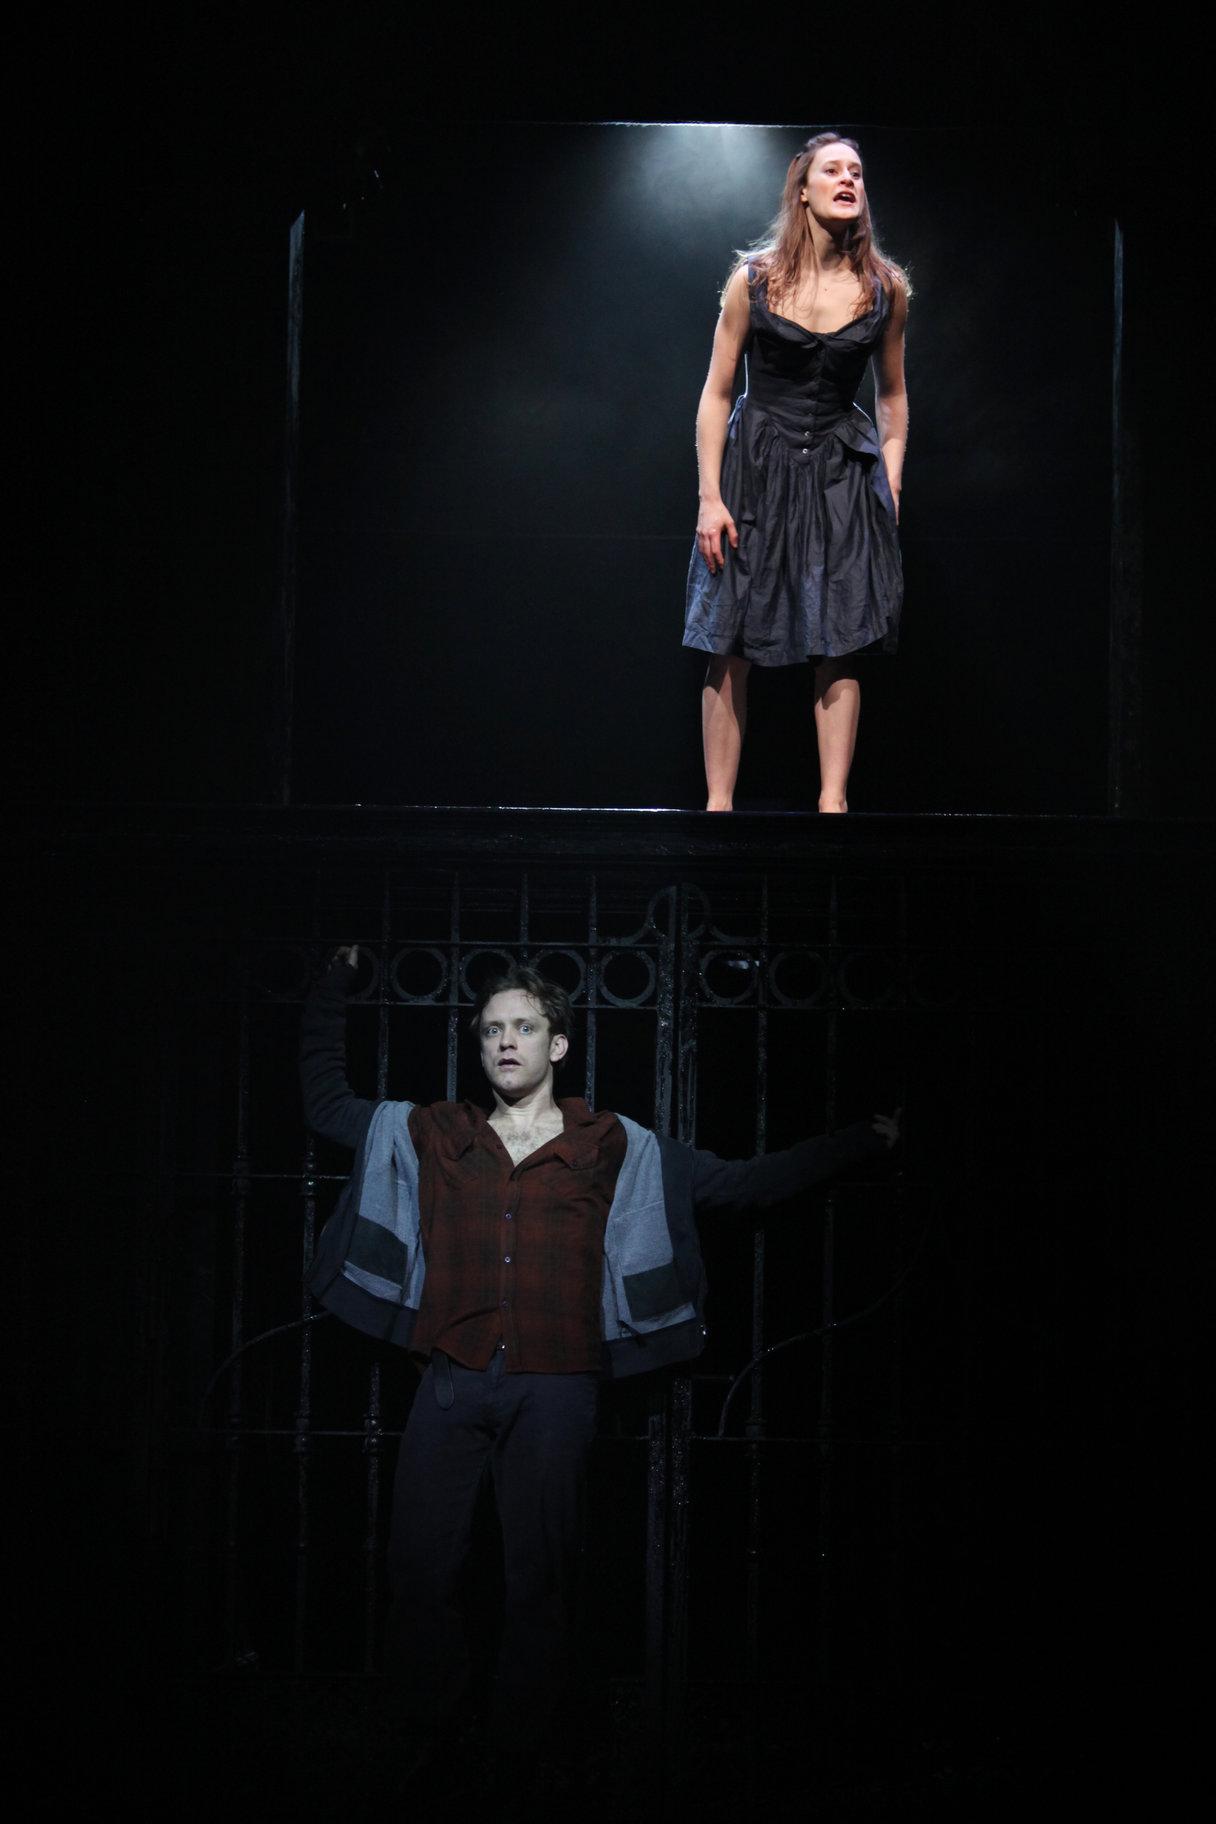 Romeo overhears Juliet.